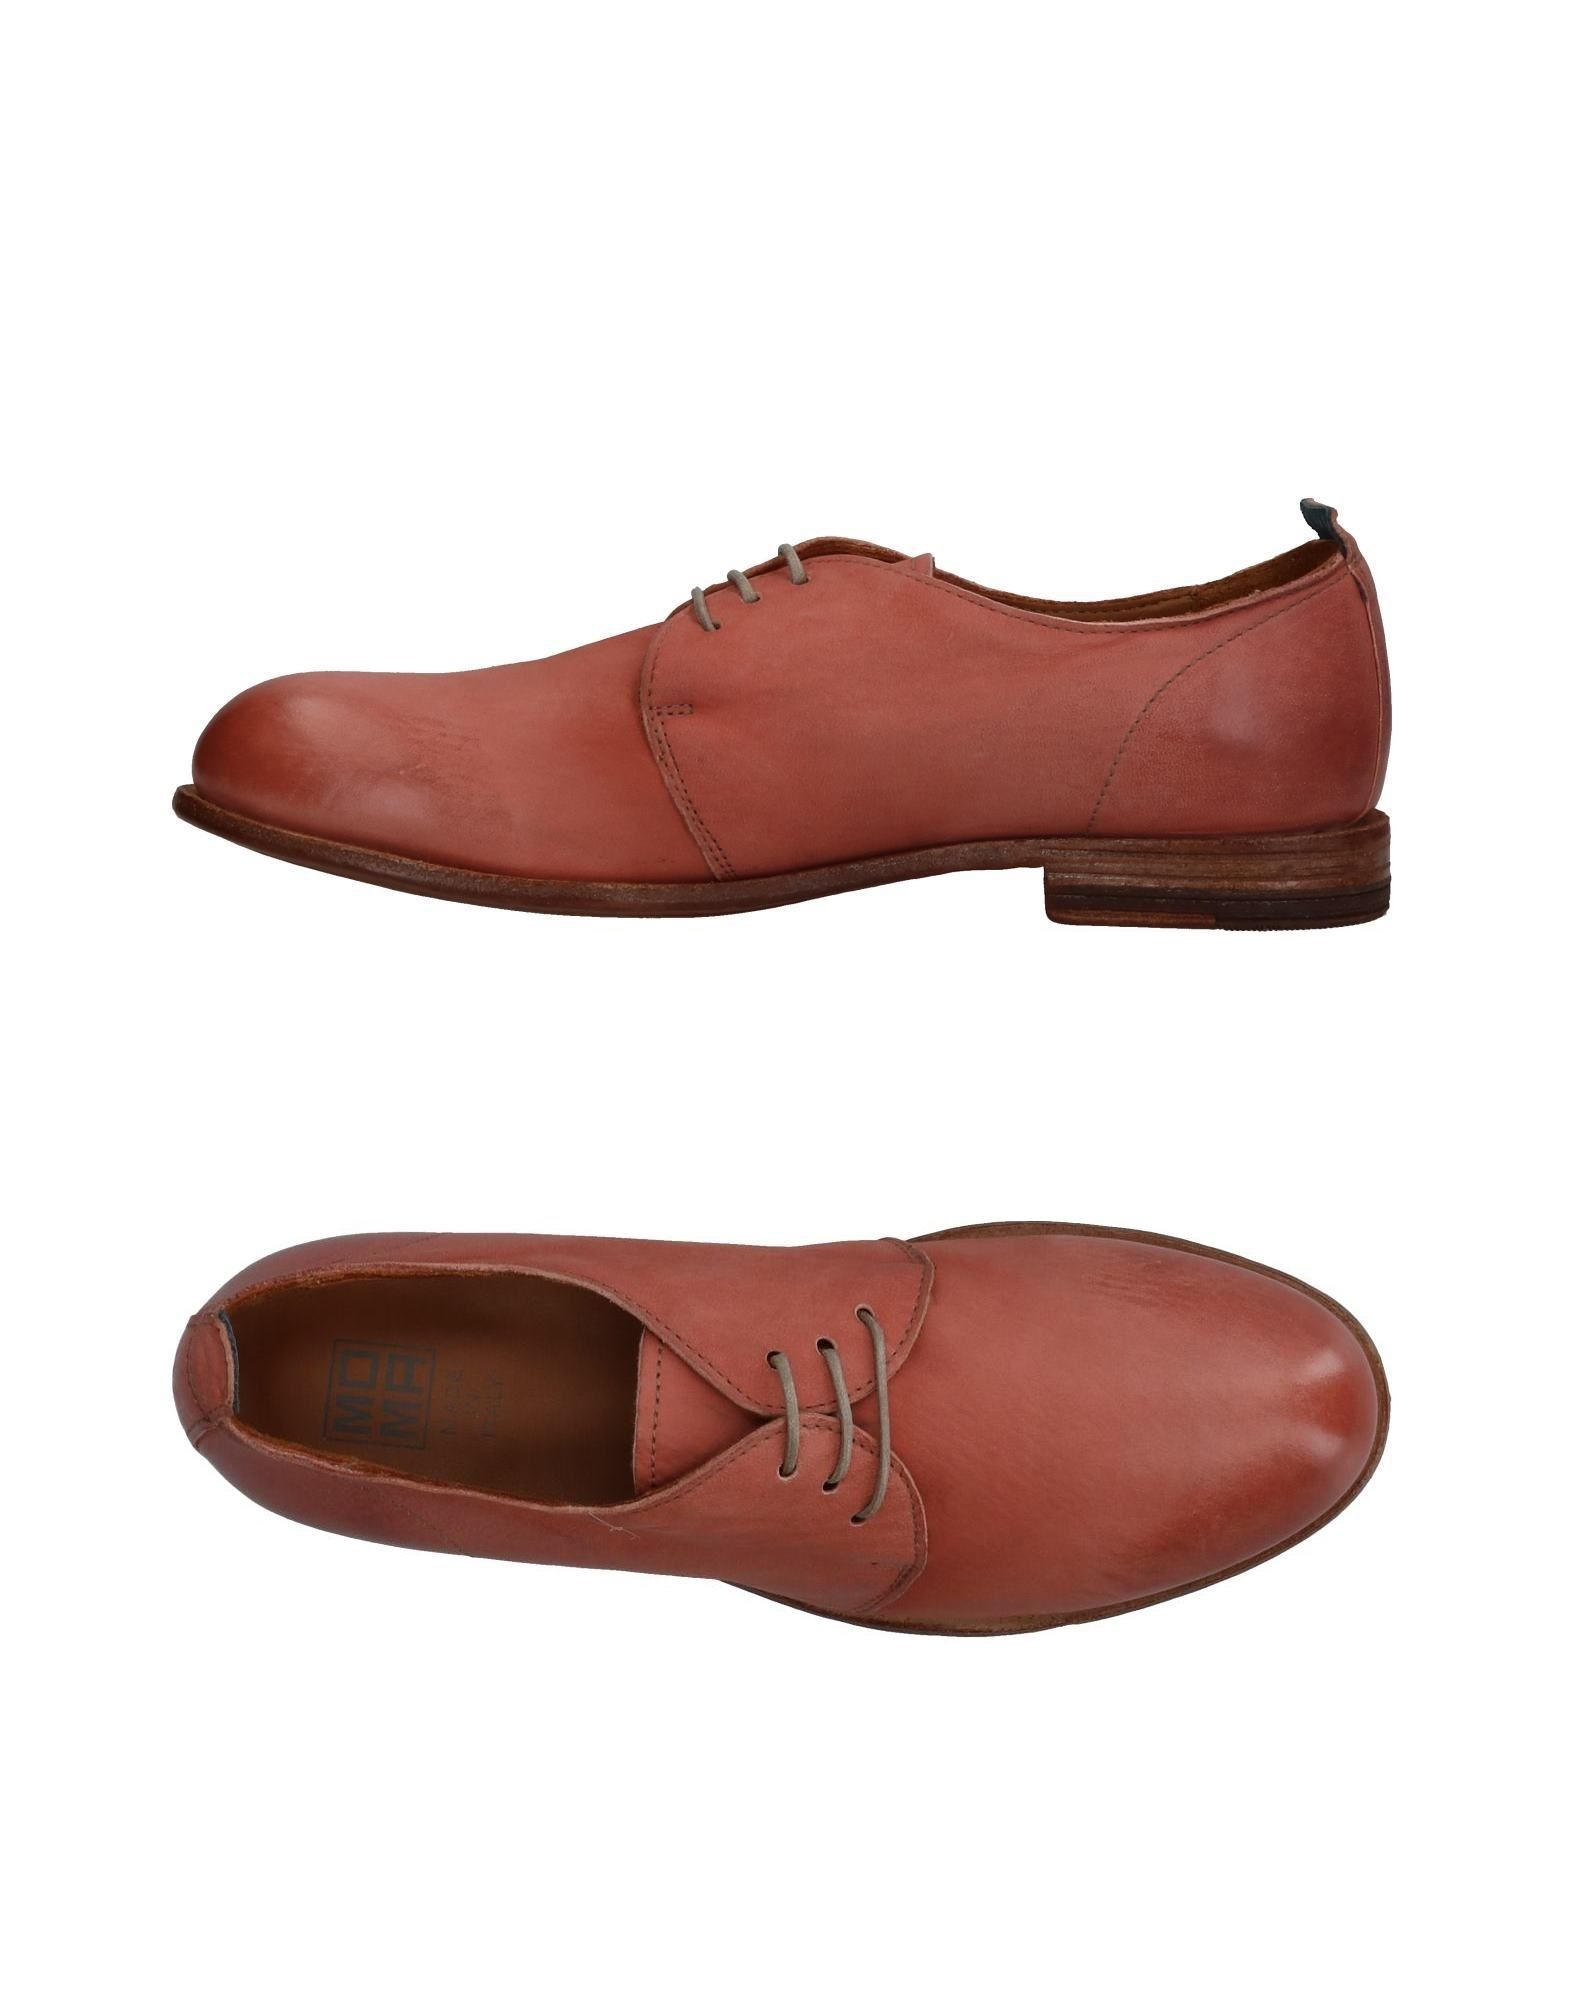 ФОТО moma обувь на шнурках